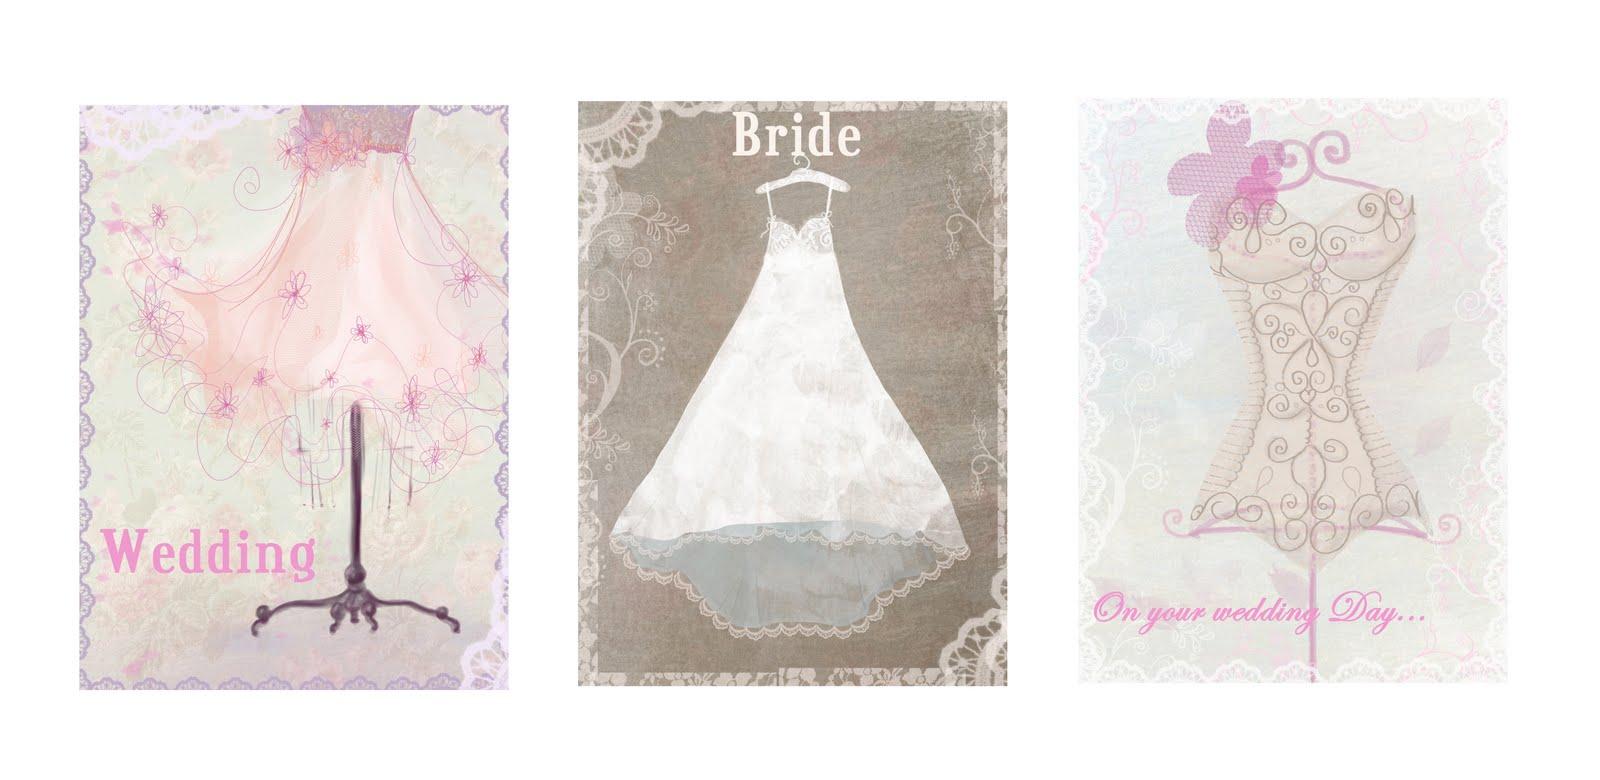 Jennie poh illustration new wedding greeting card designs new wedding greeting card designs m4hsunfo